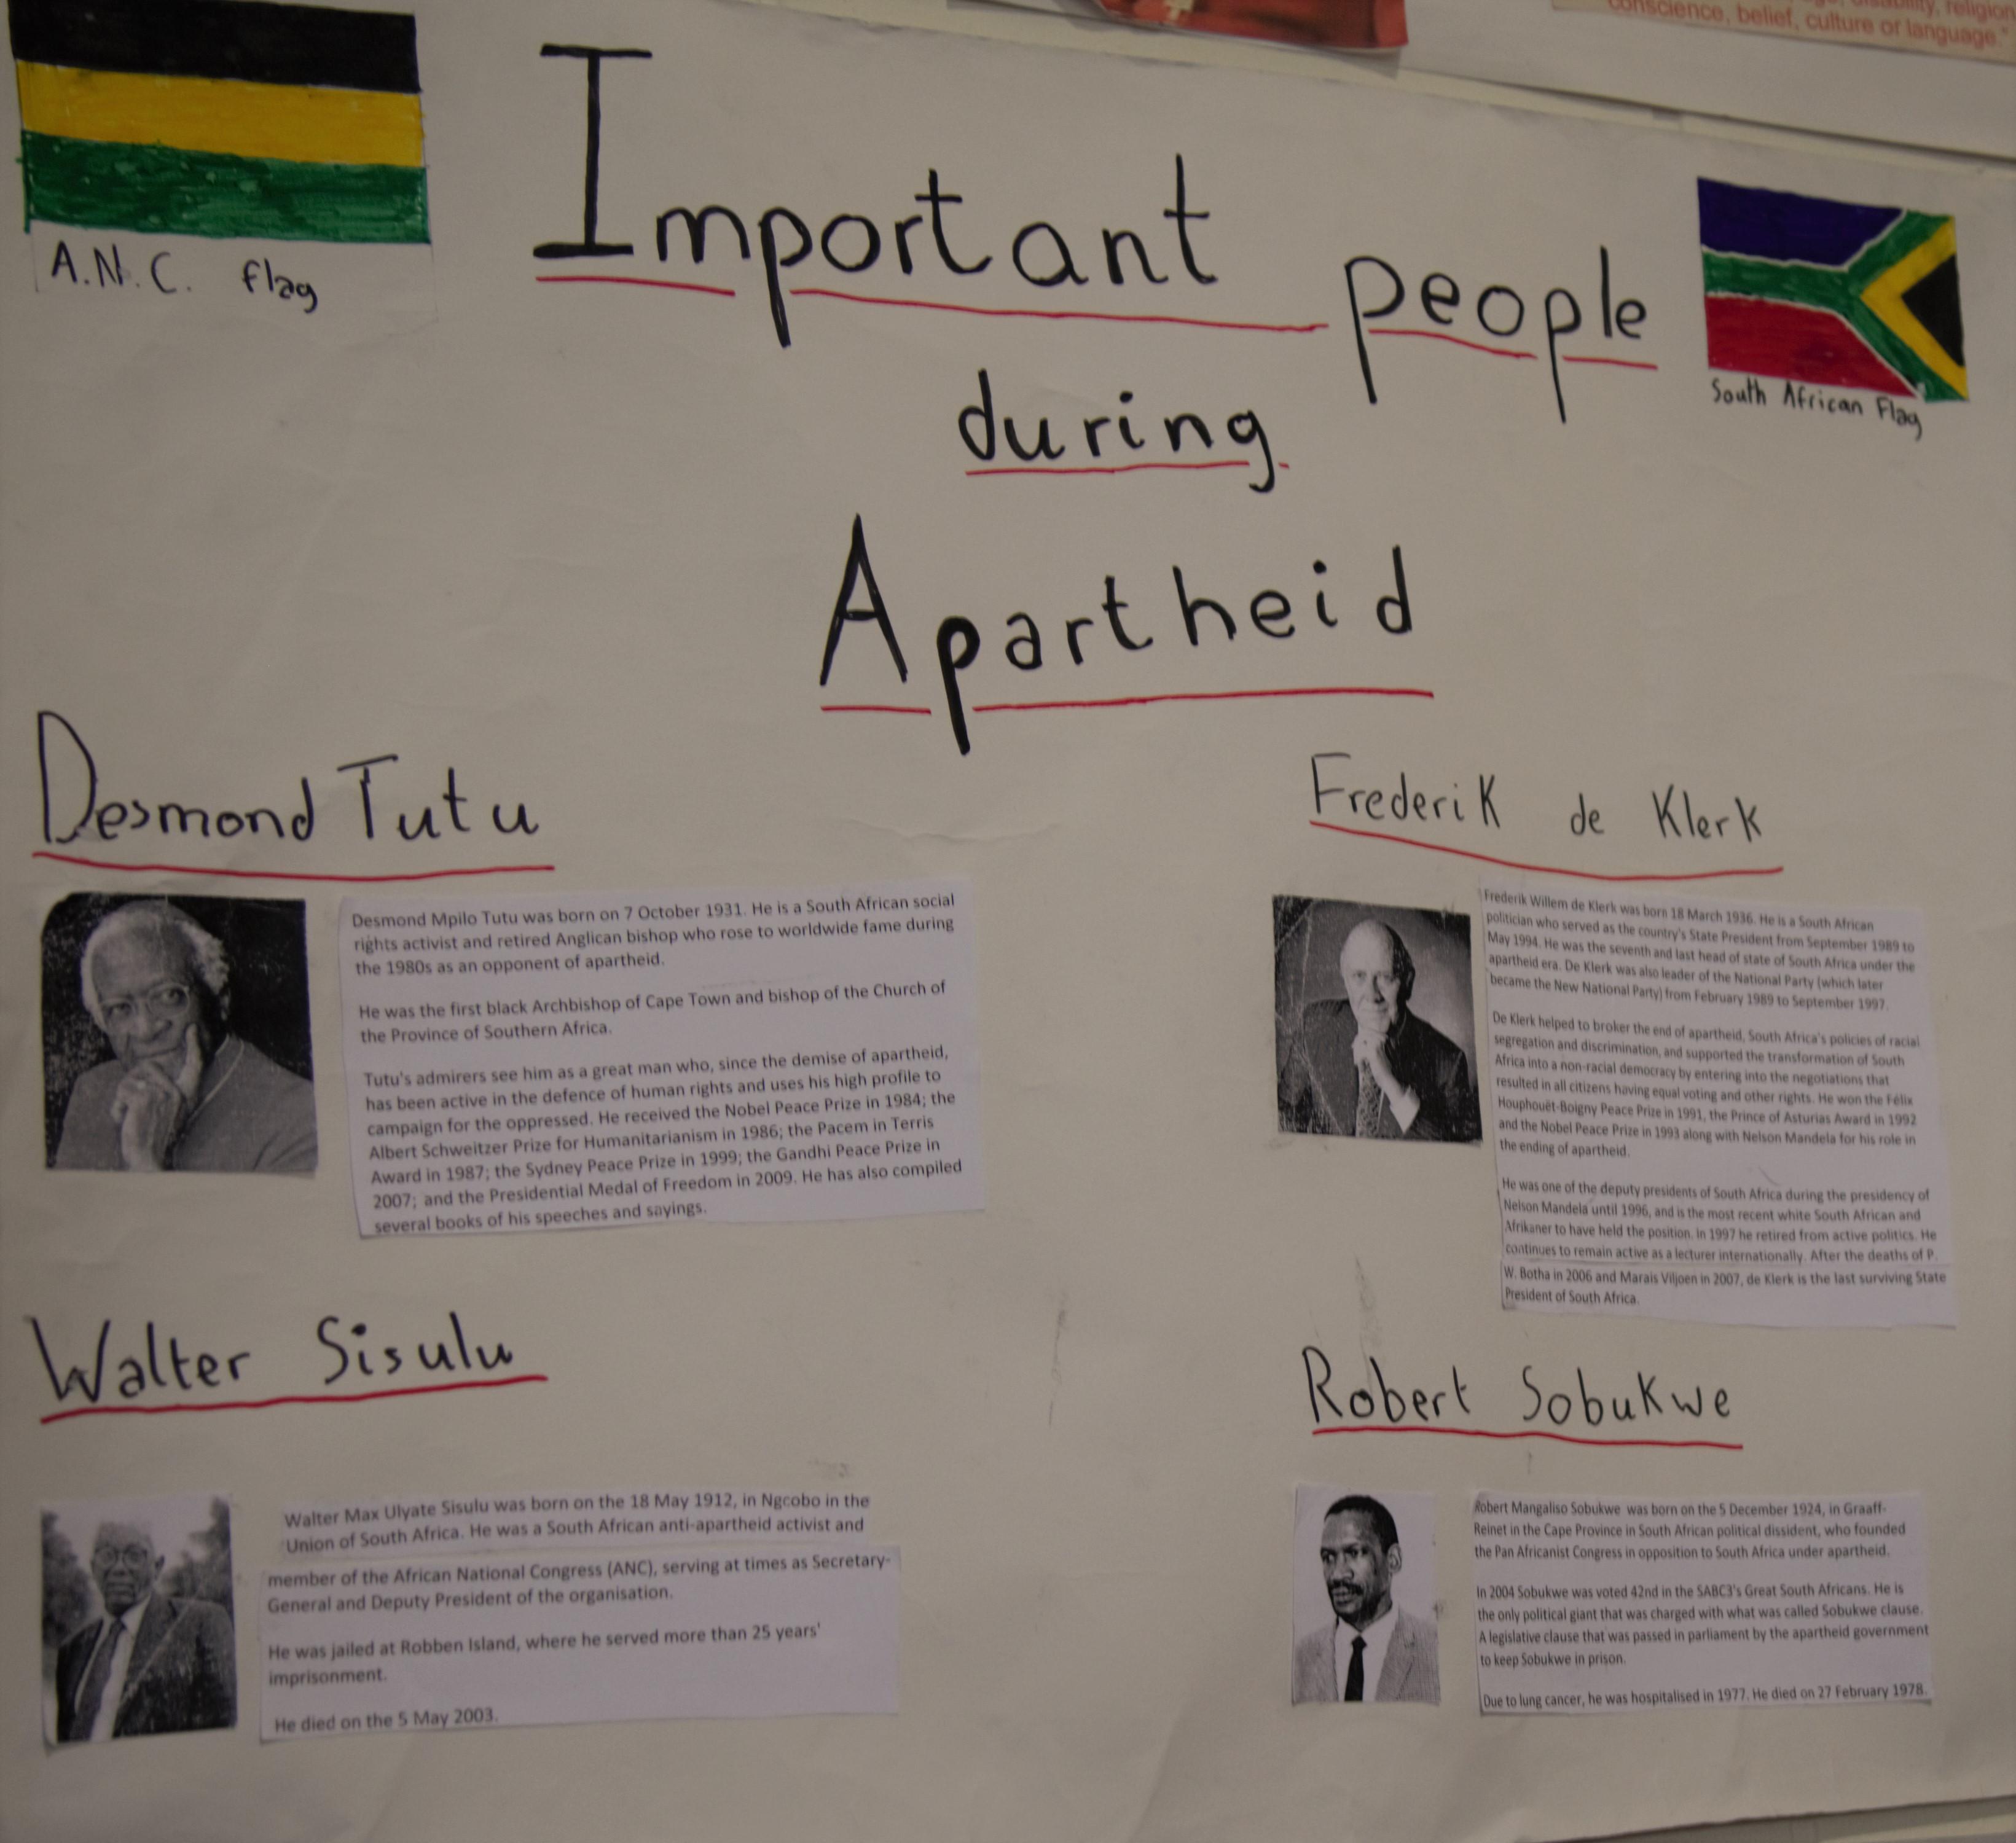 Laws of Apartheid